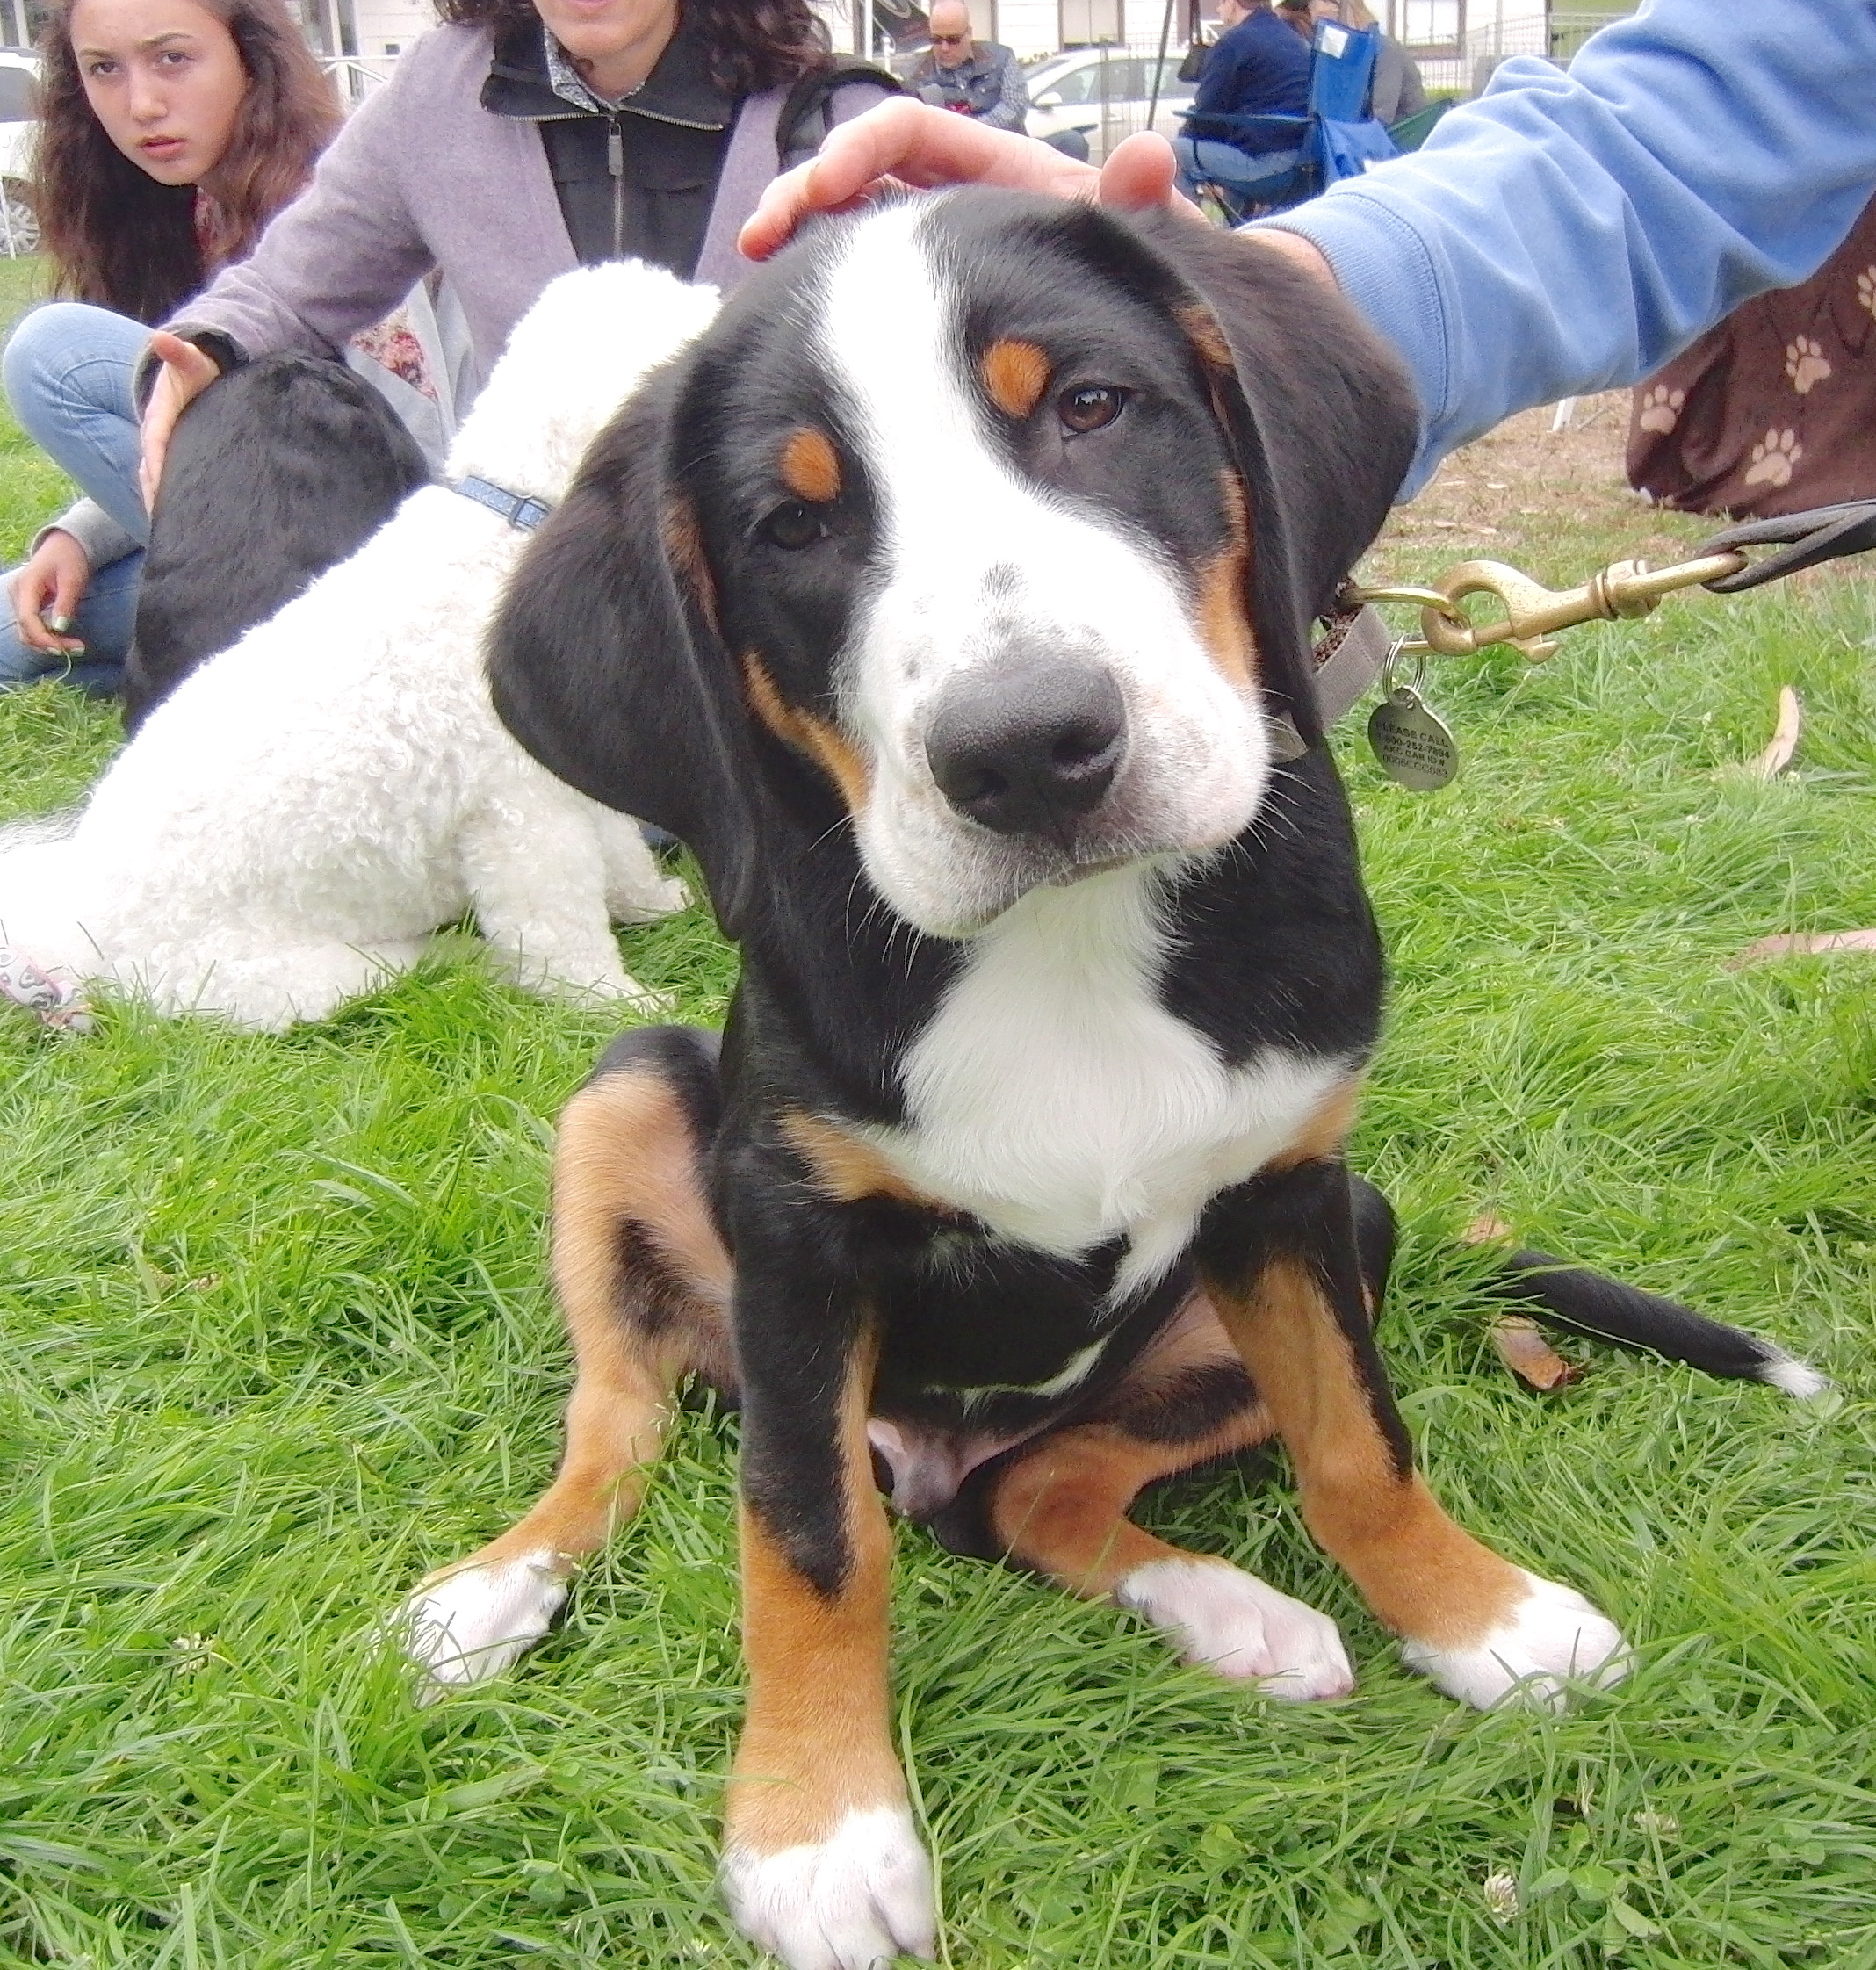 Swiss Mountain Dog of Some Kind